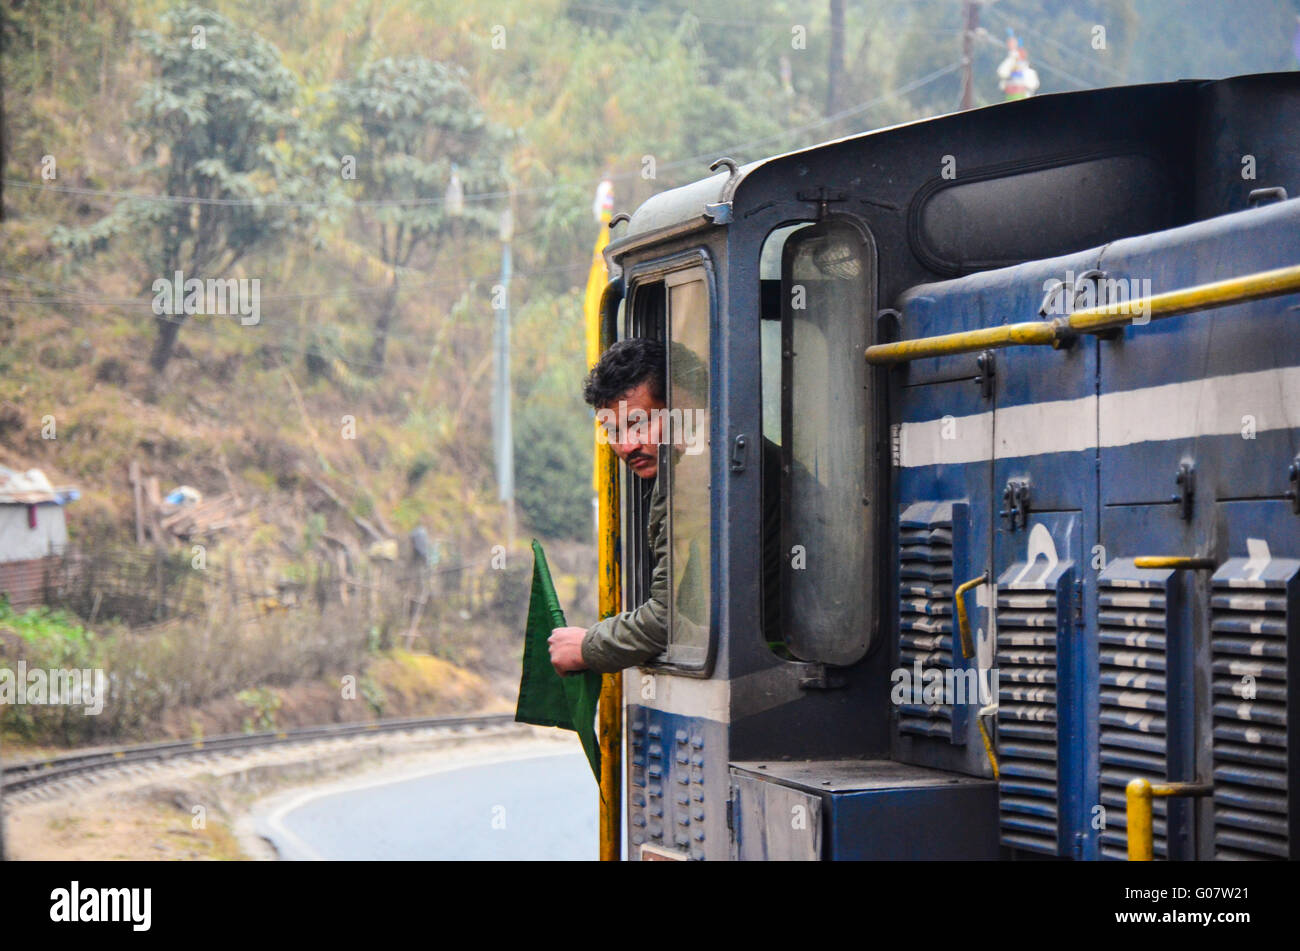 Loco pilot of the Darjeeling Himalayan Railway Toy Train showing green flag, looking behind. - Stock Image